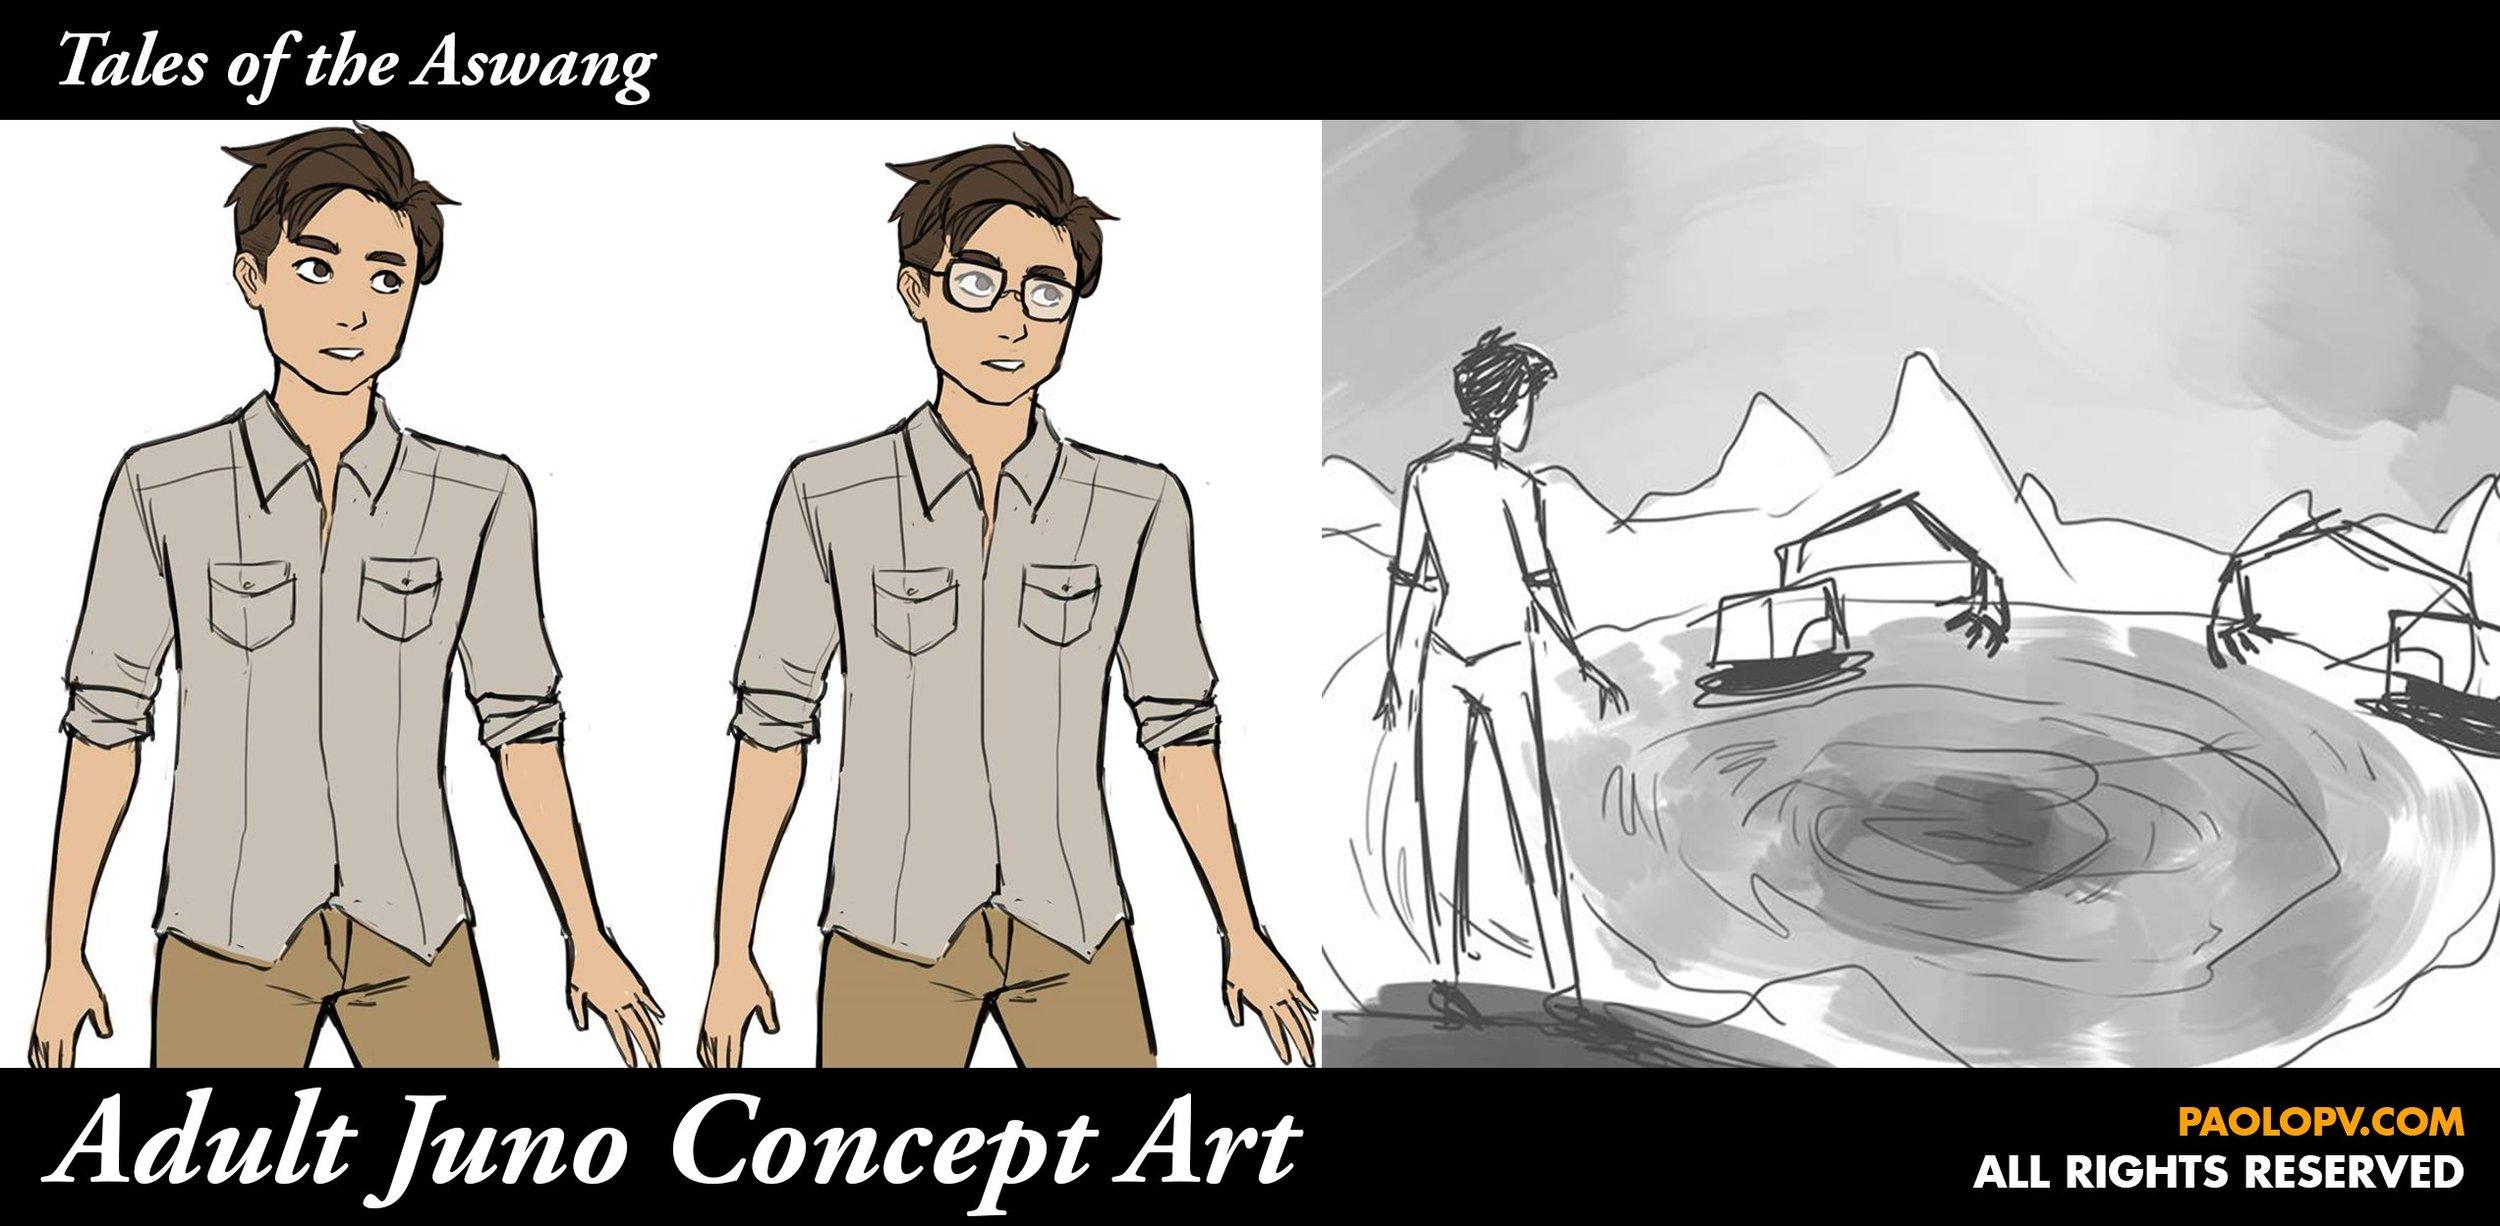 Tales-of-the-Aswang-Concept-Art-Adult-Juno.jpg